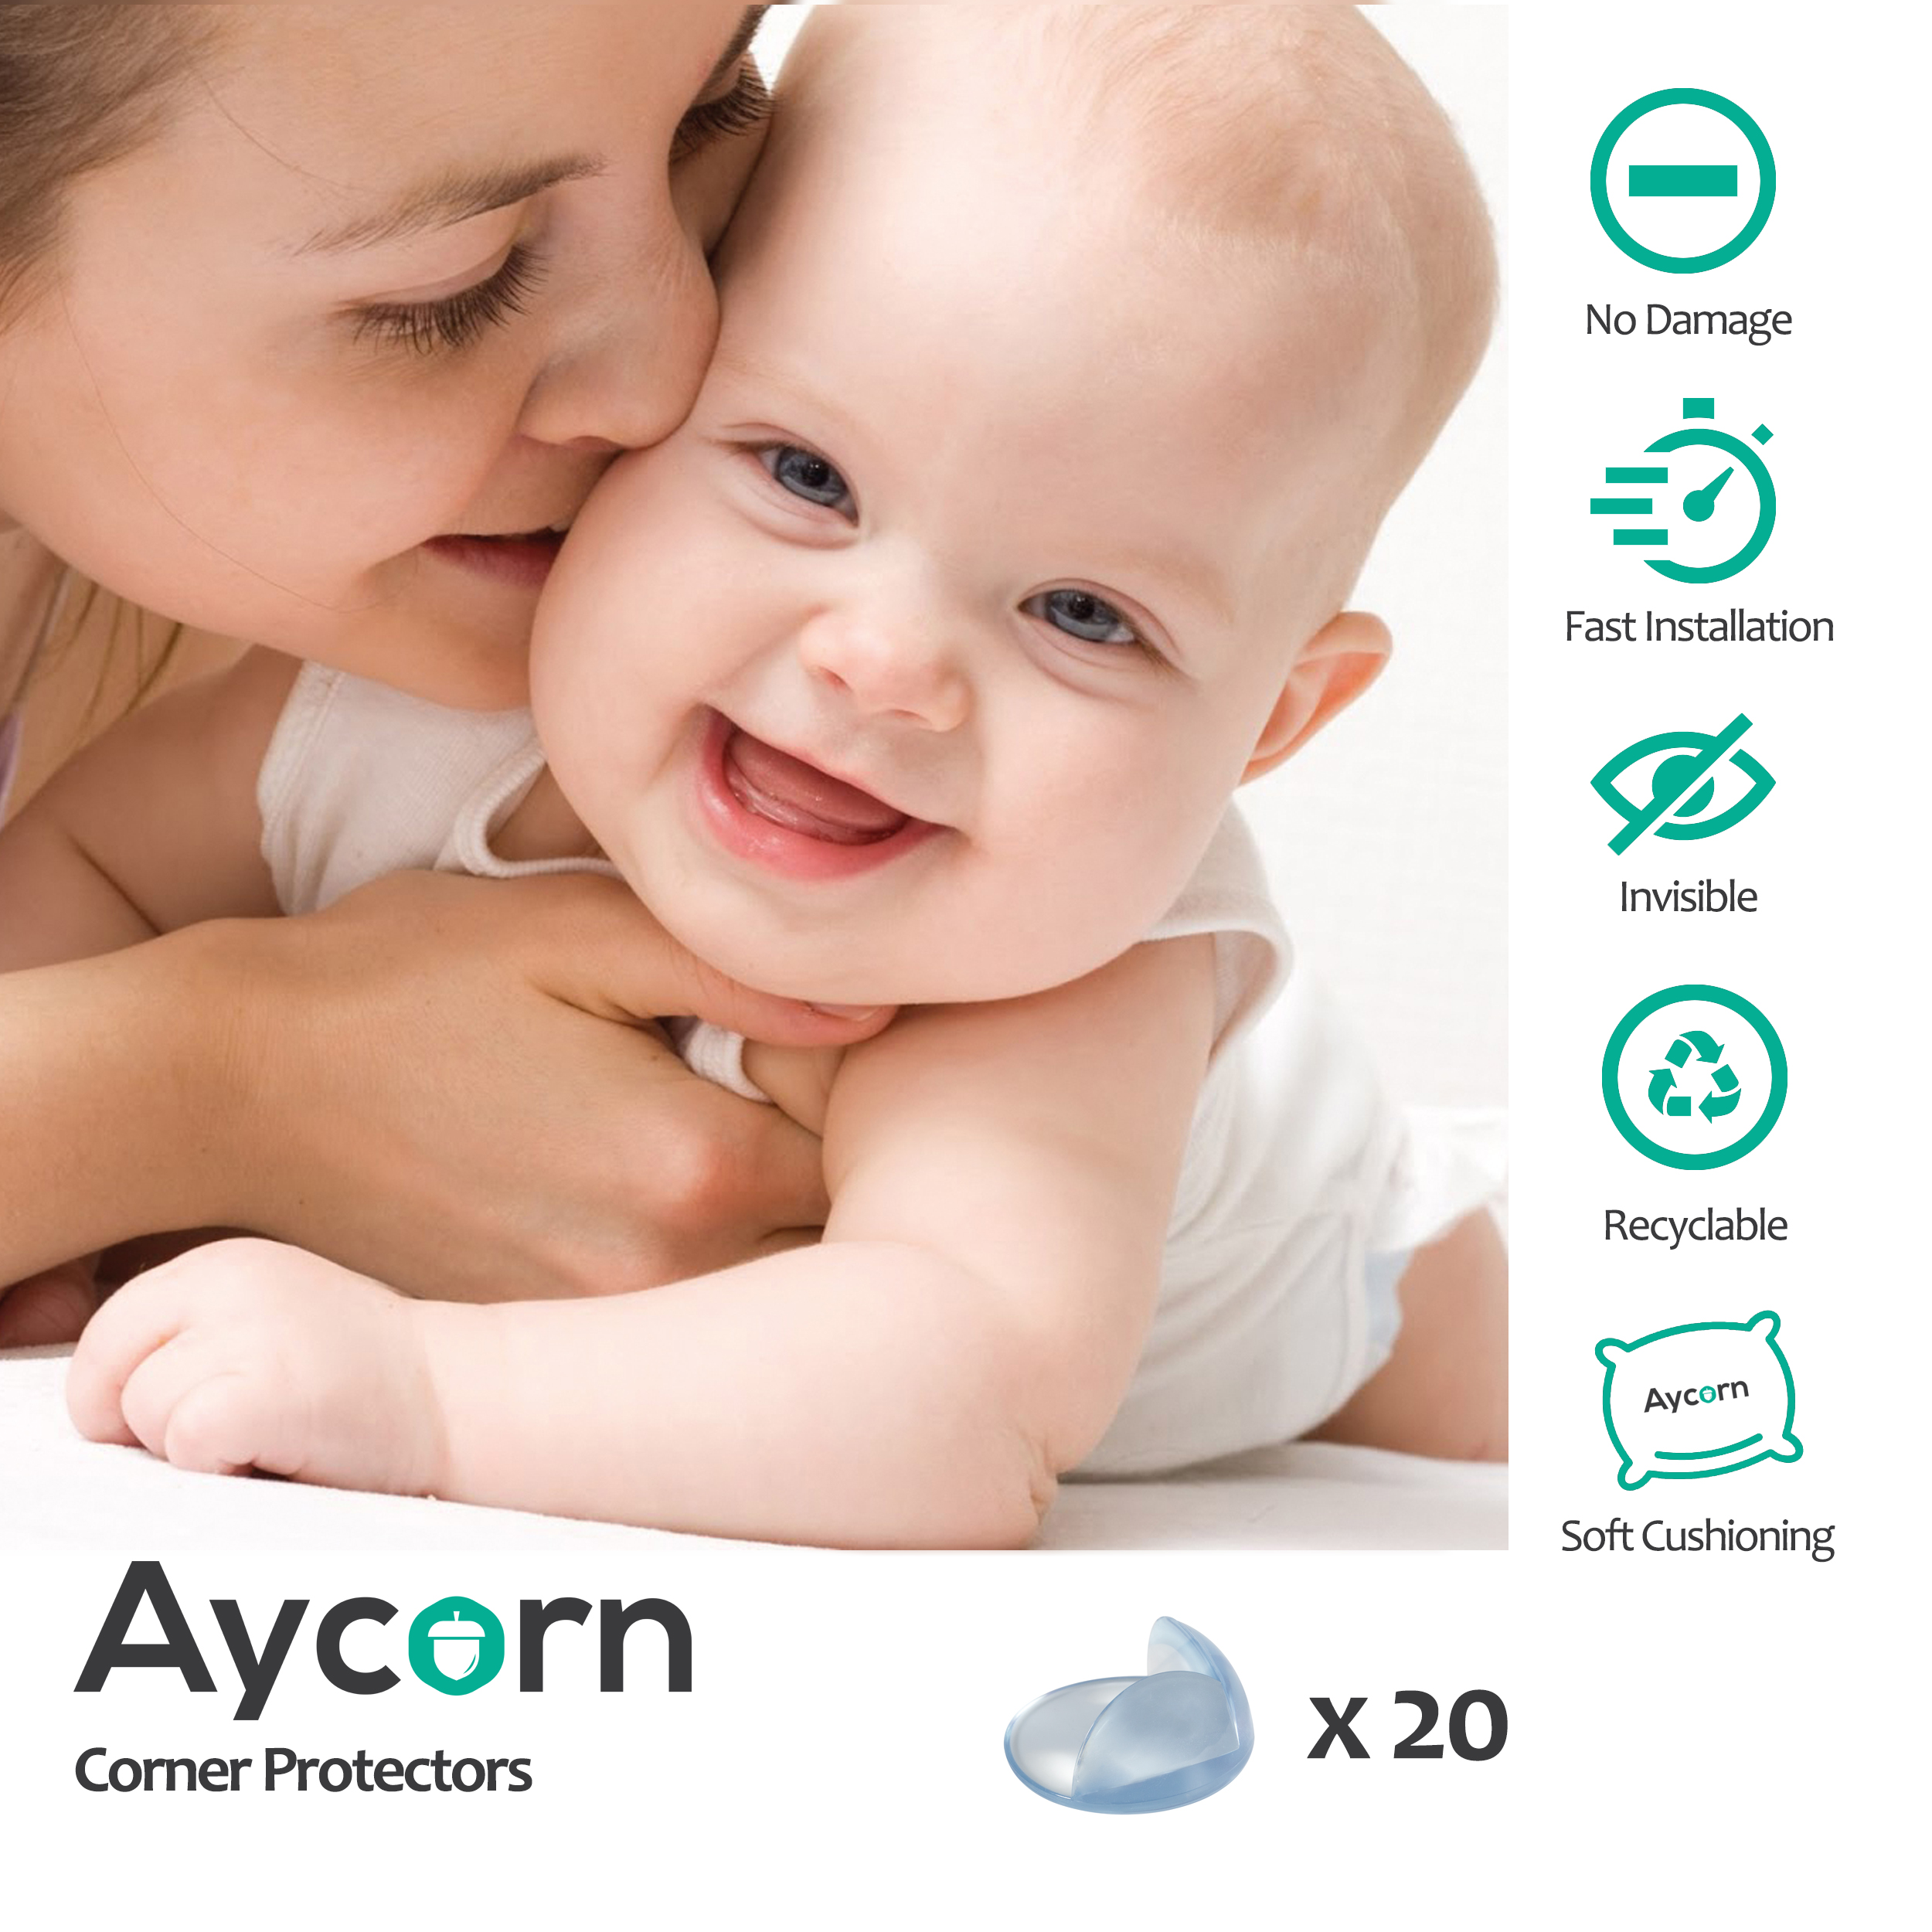 Aycorn Corner Protectors